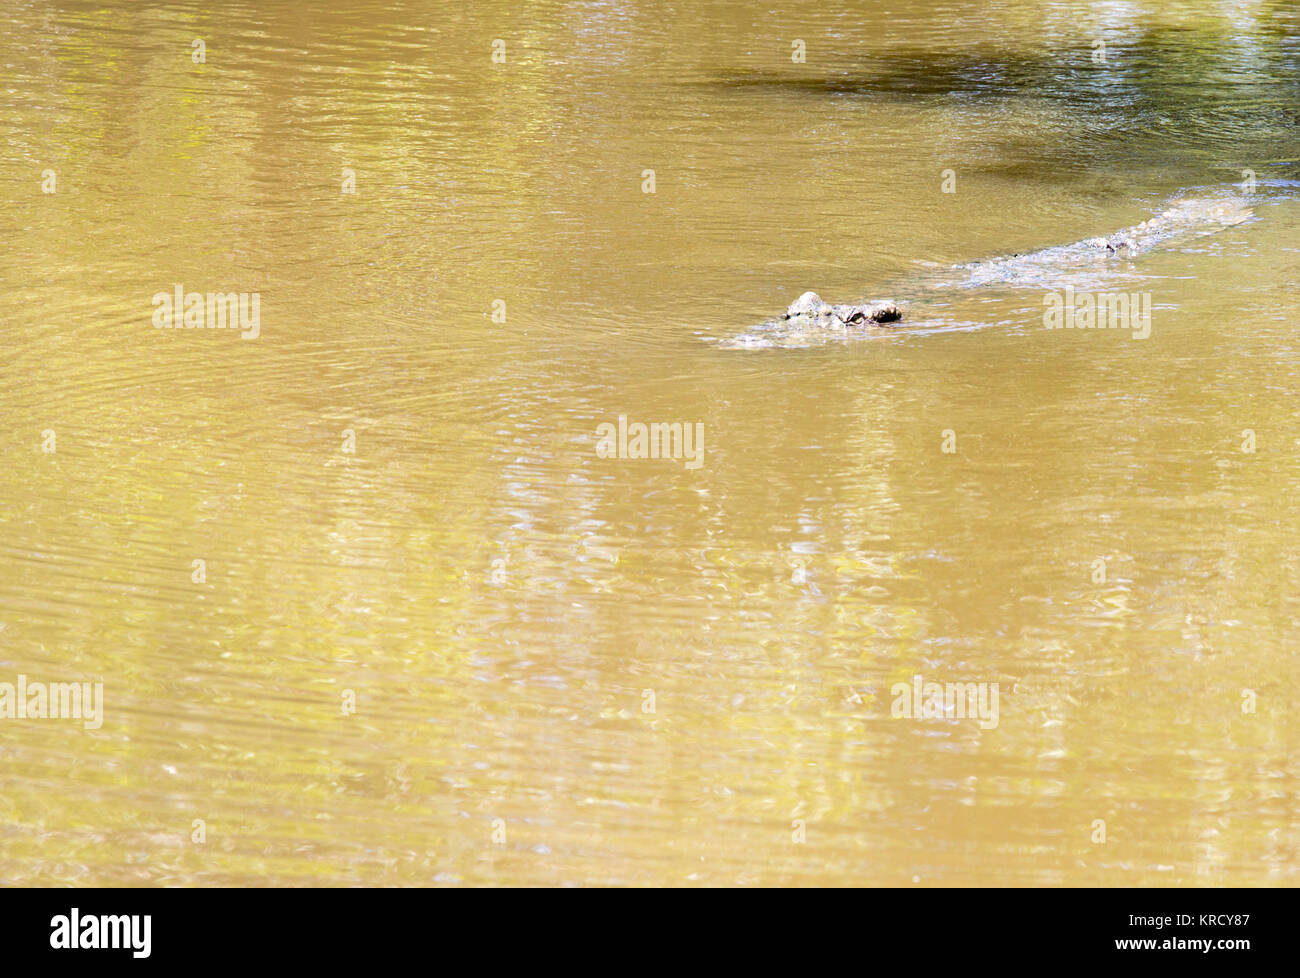 Crocodile portrait - Stock Image